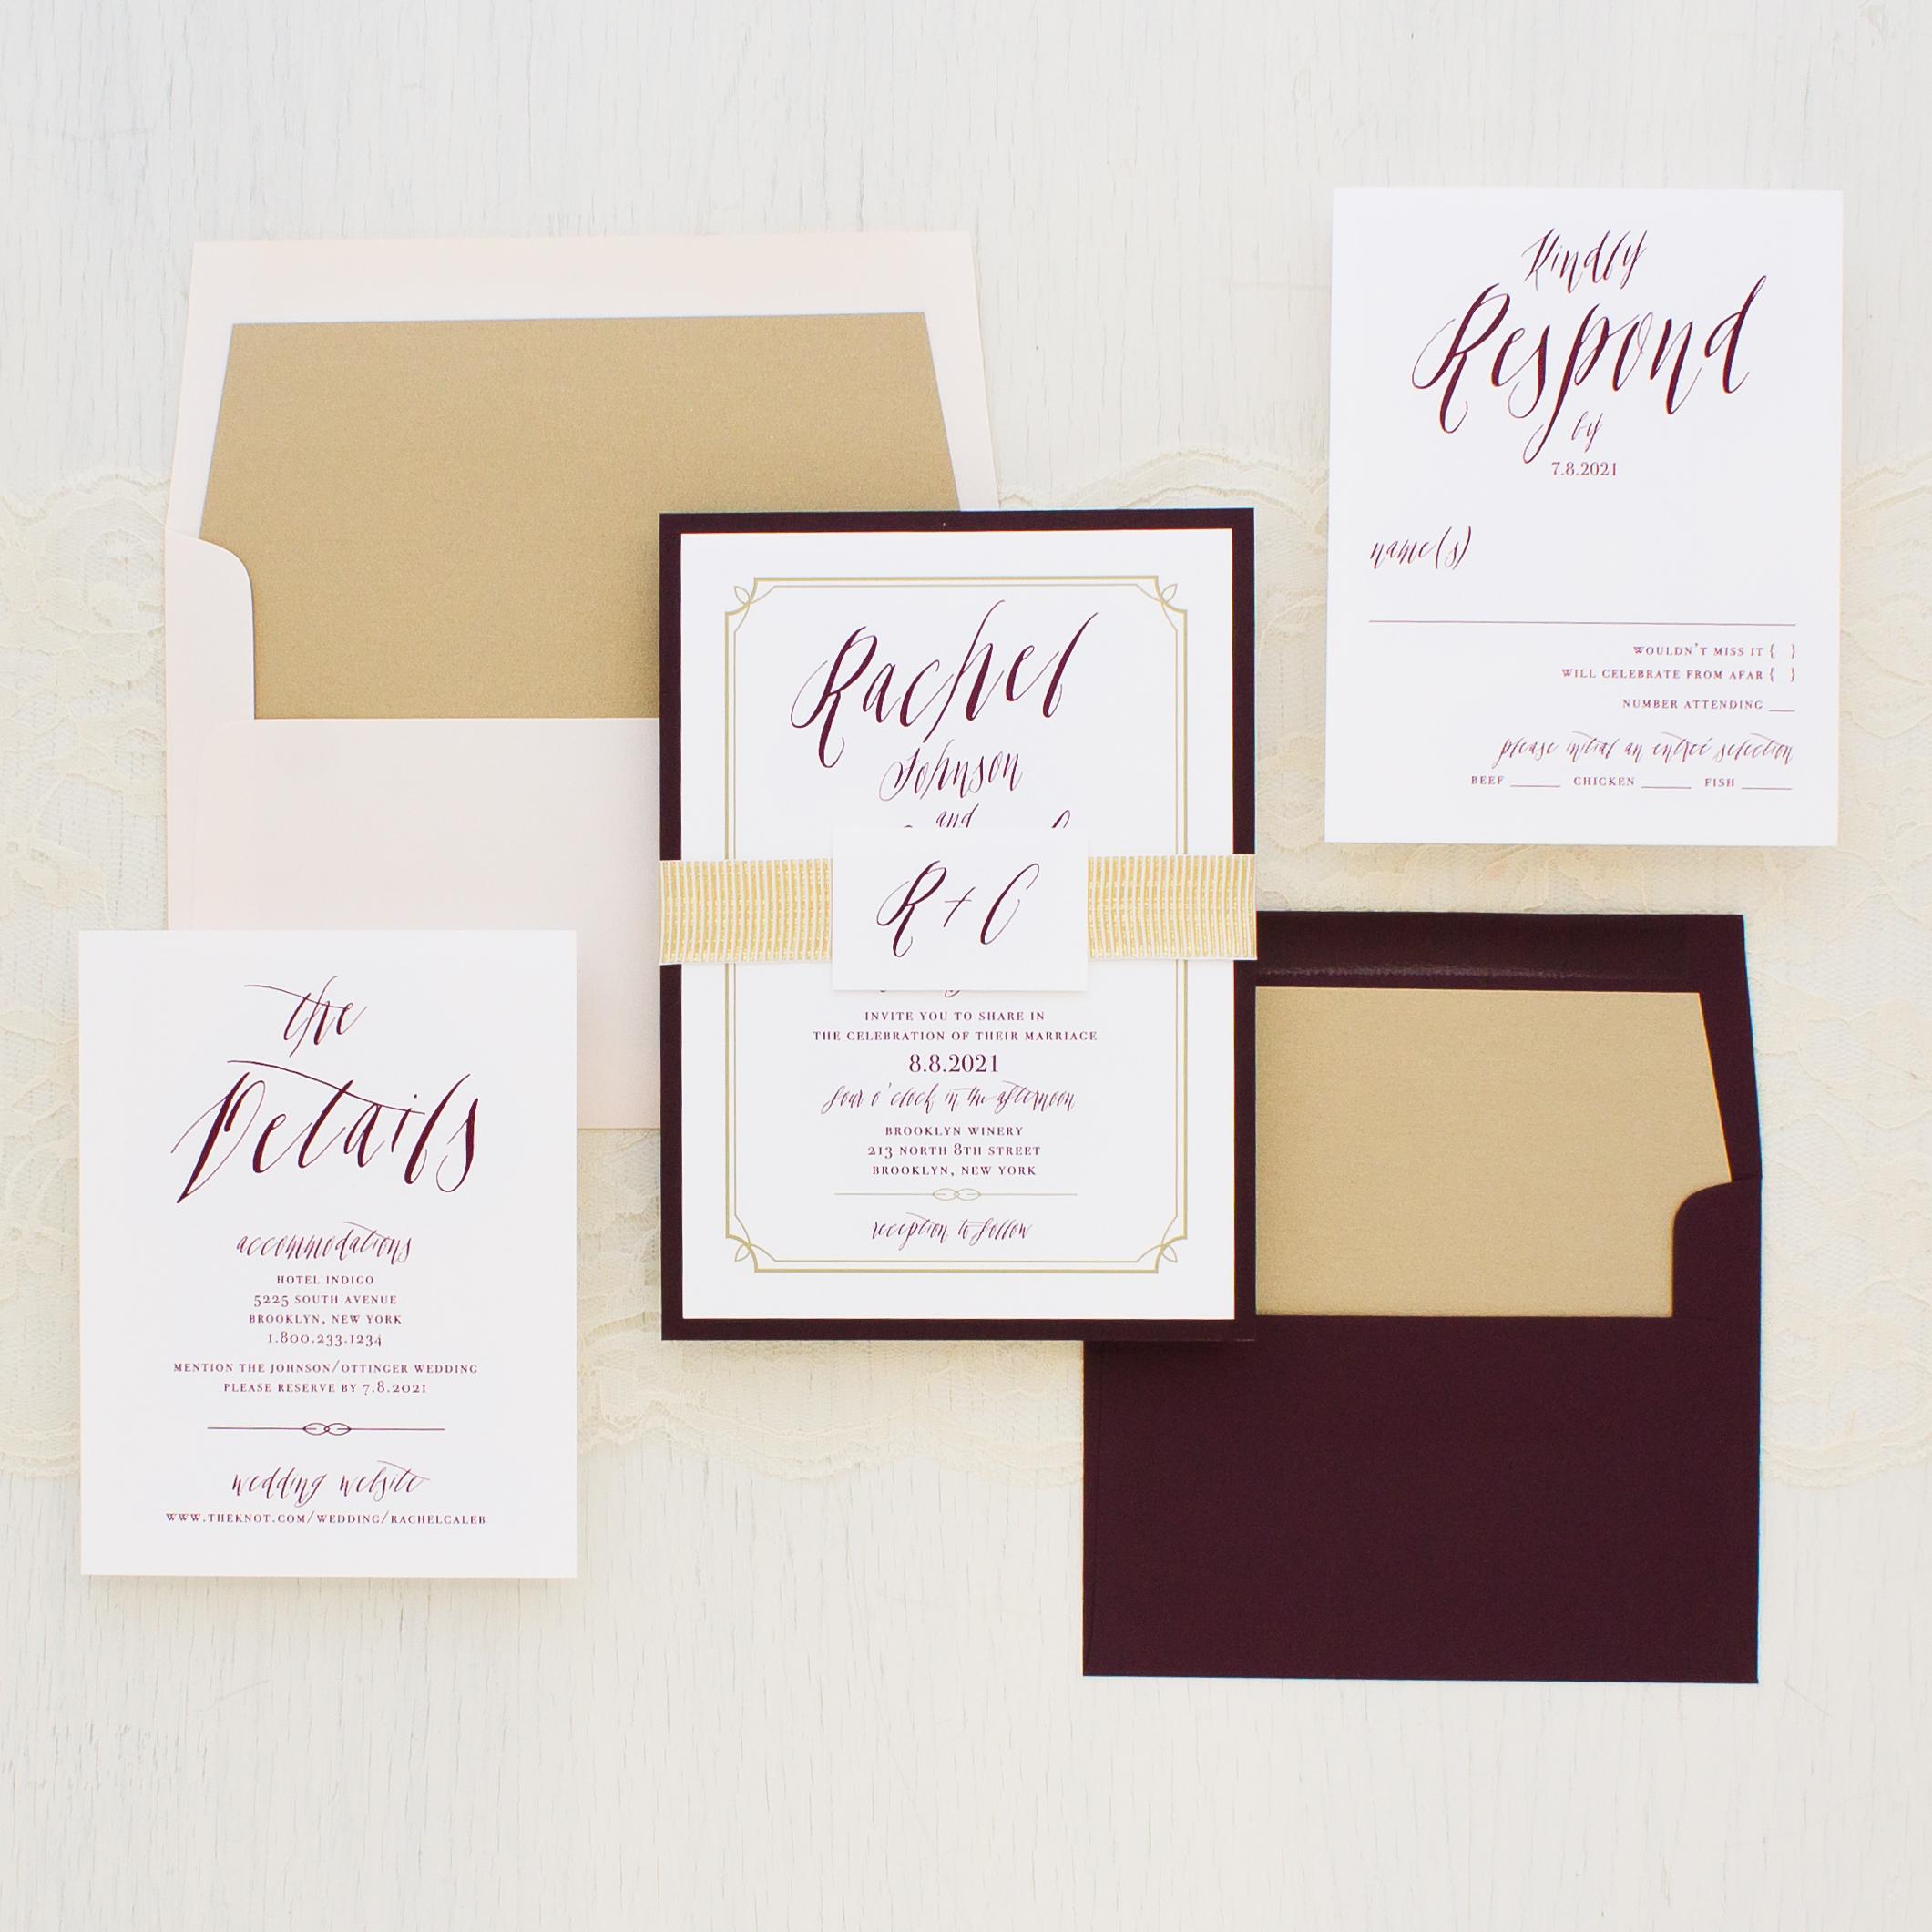 Blush & Burgundy Wedding Invitations | Beacon Lane